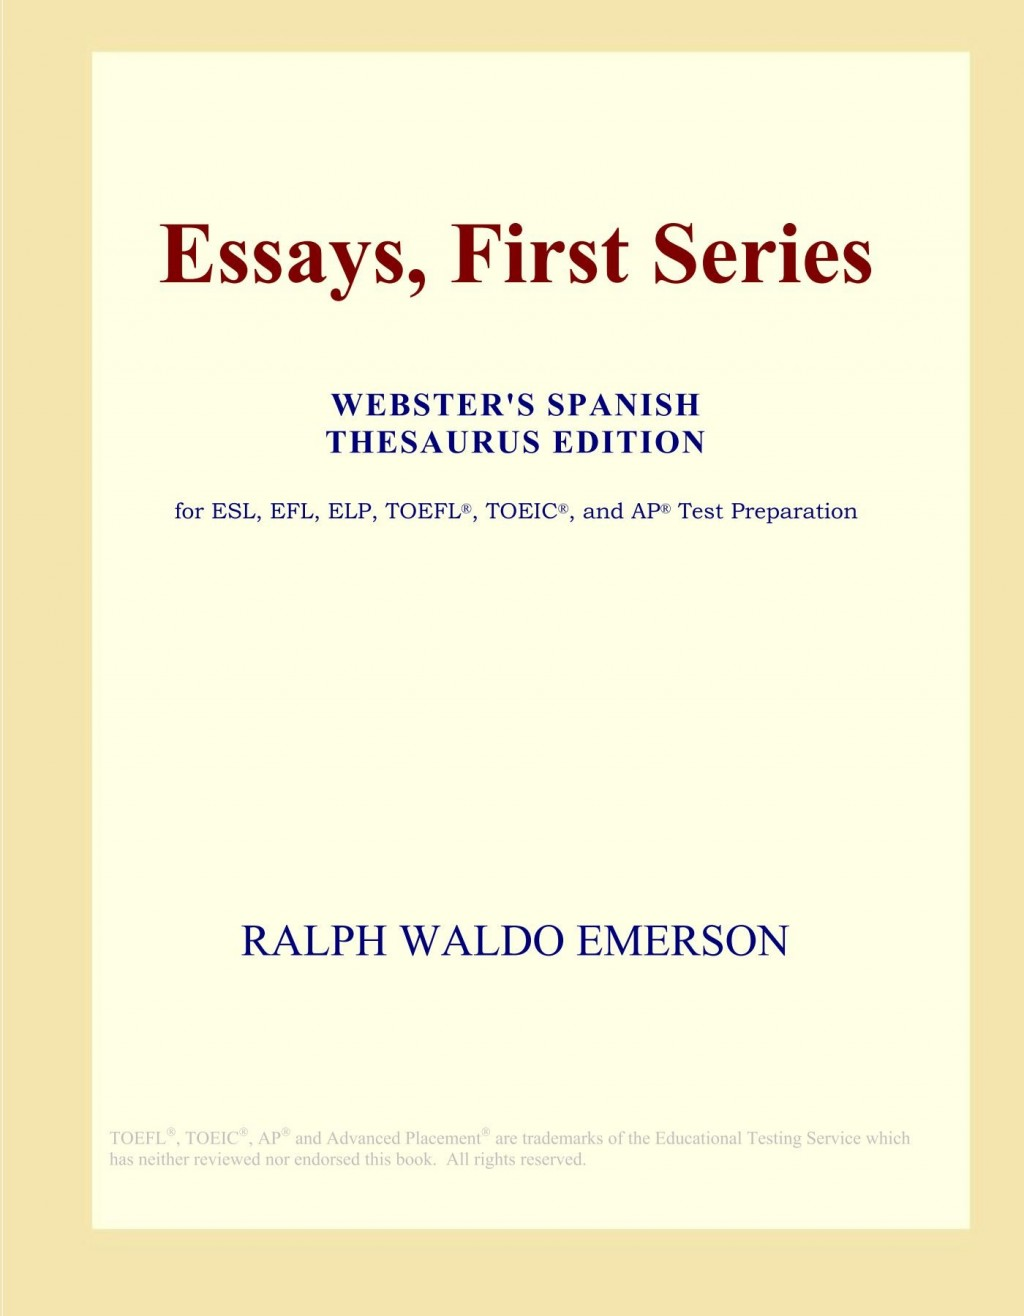 024 Essay Example 61cjxhnthzl Essays First Stunning Series In Zen Buddhism Emerson's Value Large